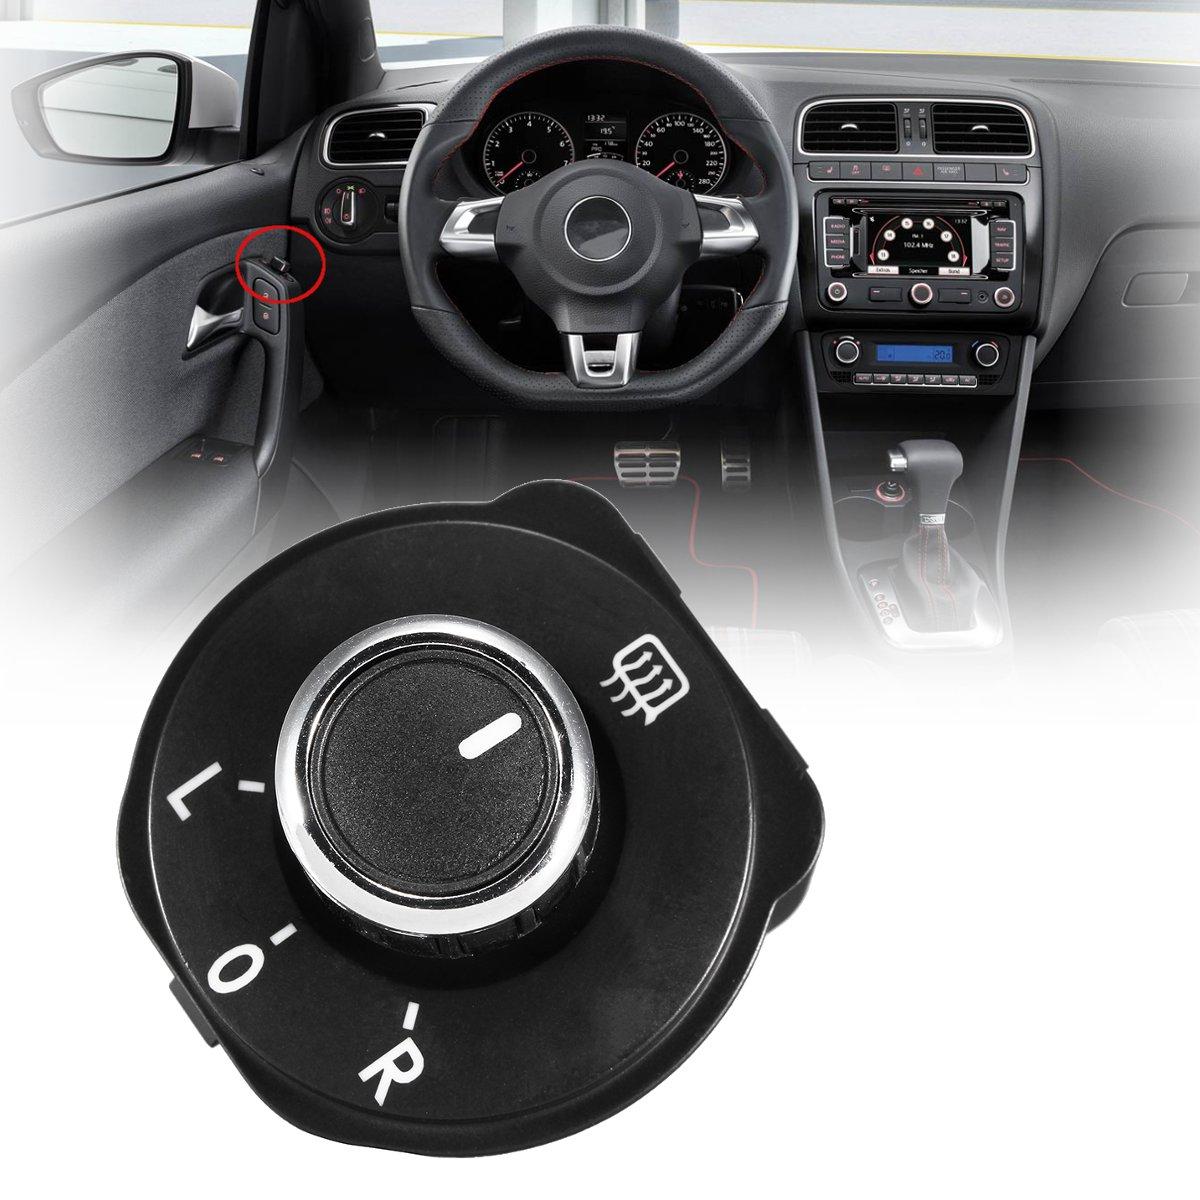 6RD959565B Auto espejo retrovisor ajuste botón interruptor para VW para Volkswagen Polo 6R 2011 2012 2013 2014 2015 2016